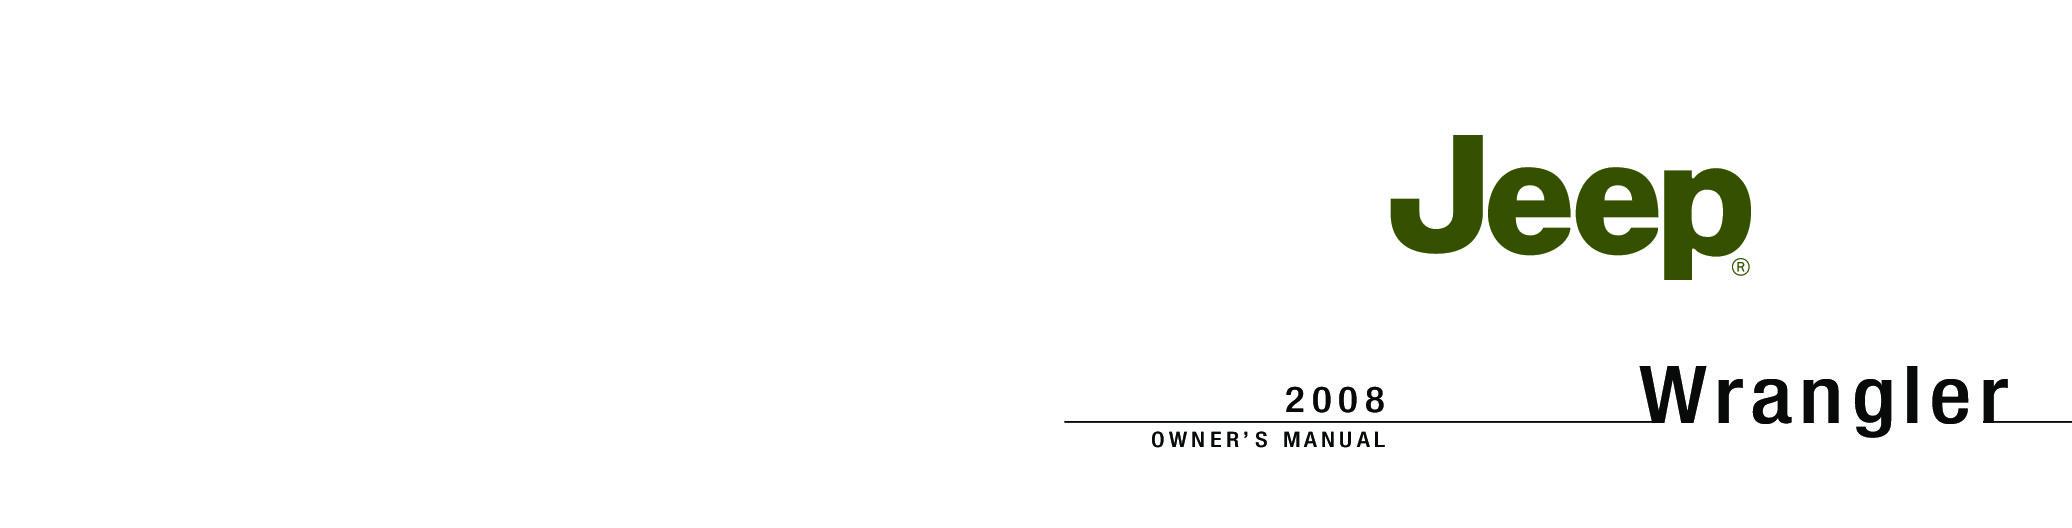 2008 jeep grand cherokee manual pdf